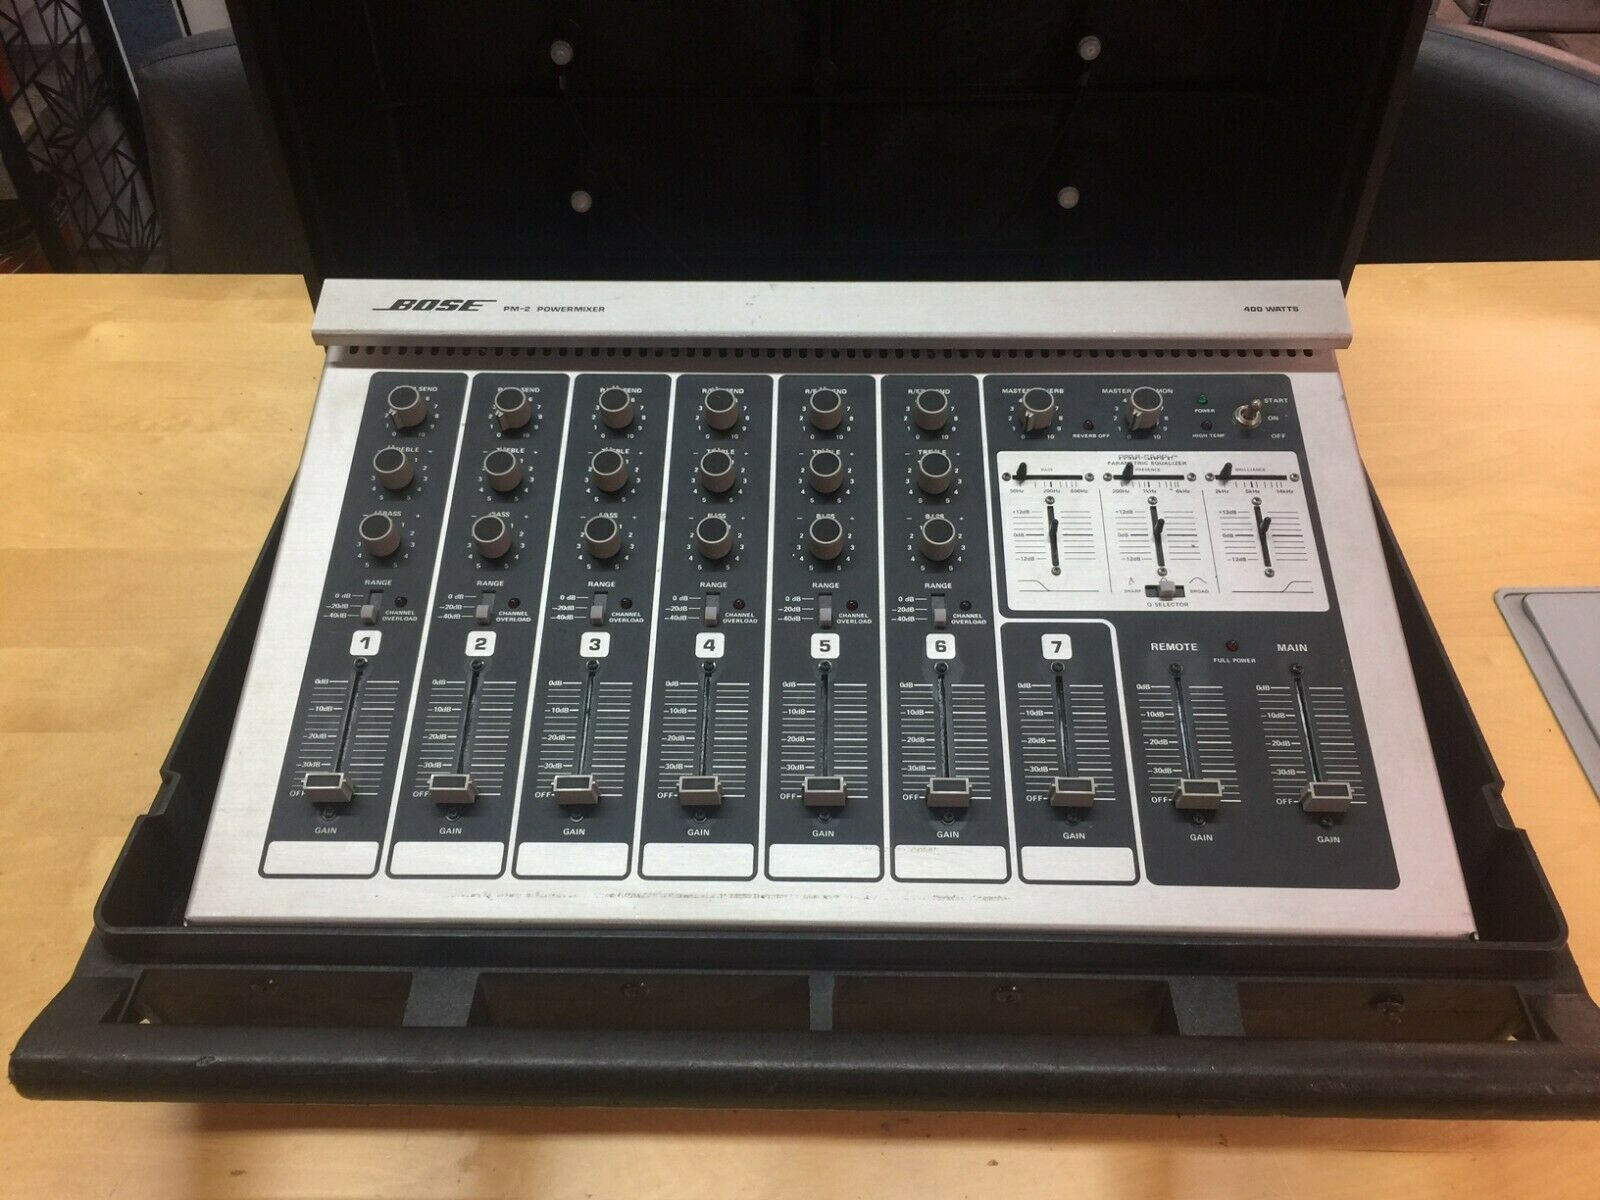 Bose PM-2 POWERMIXER 400WATT w Case